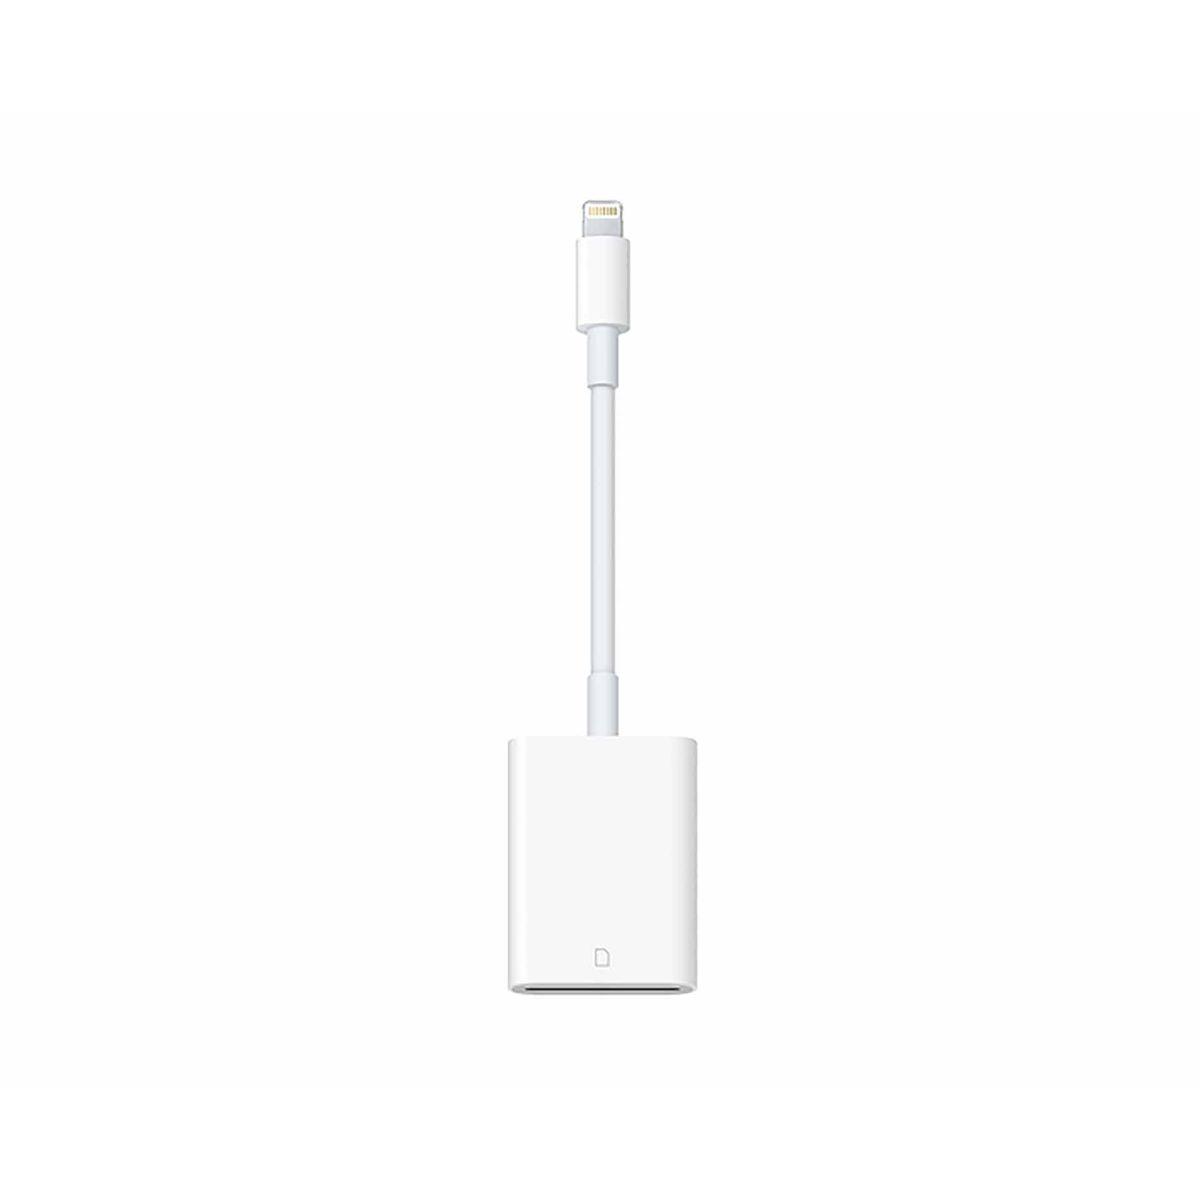 Image of Apple Lightning to SD Card Reader